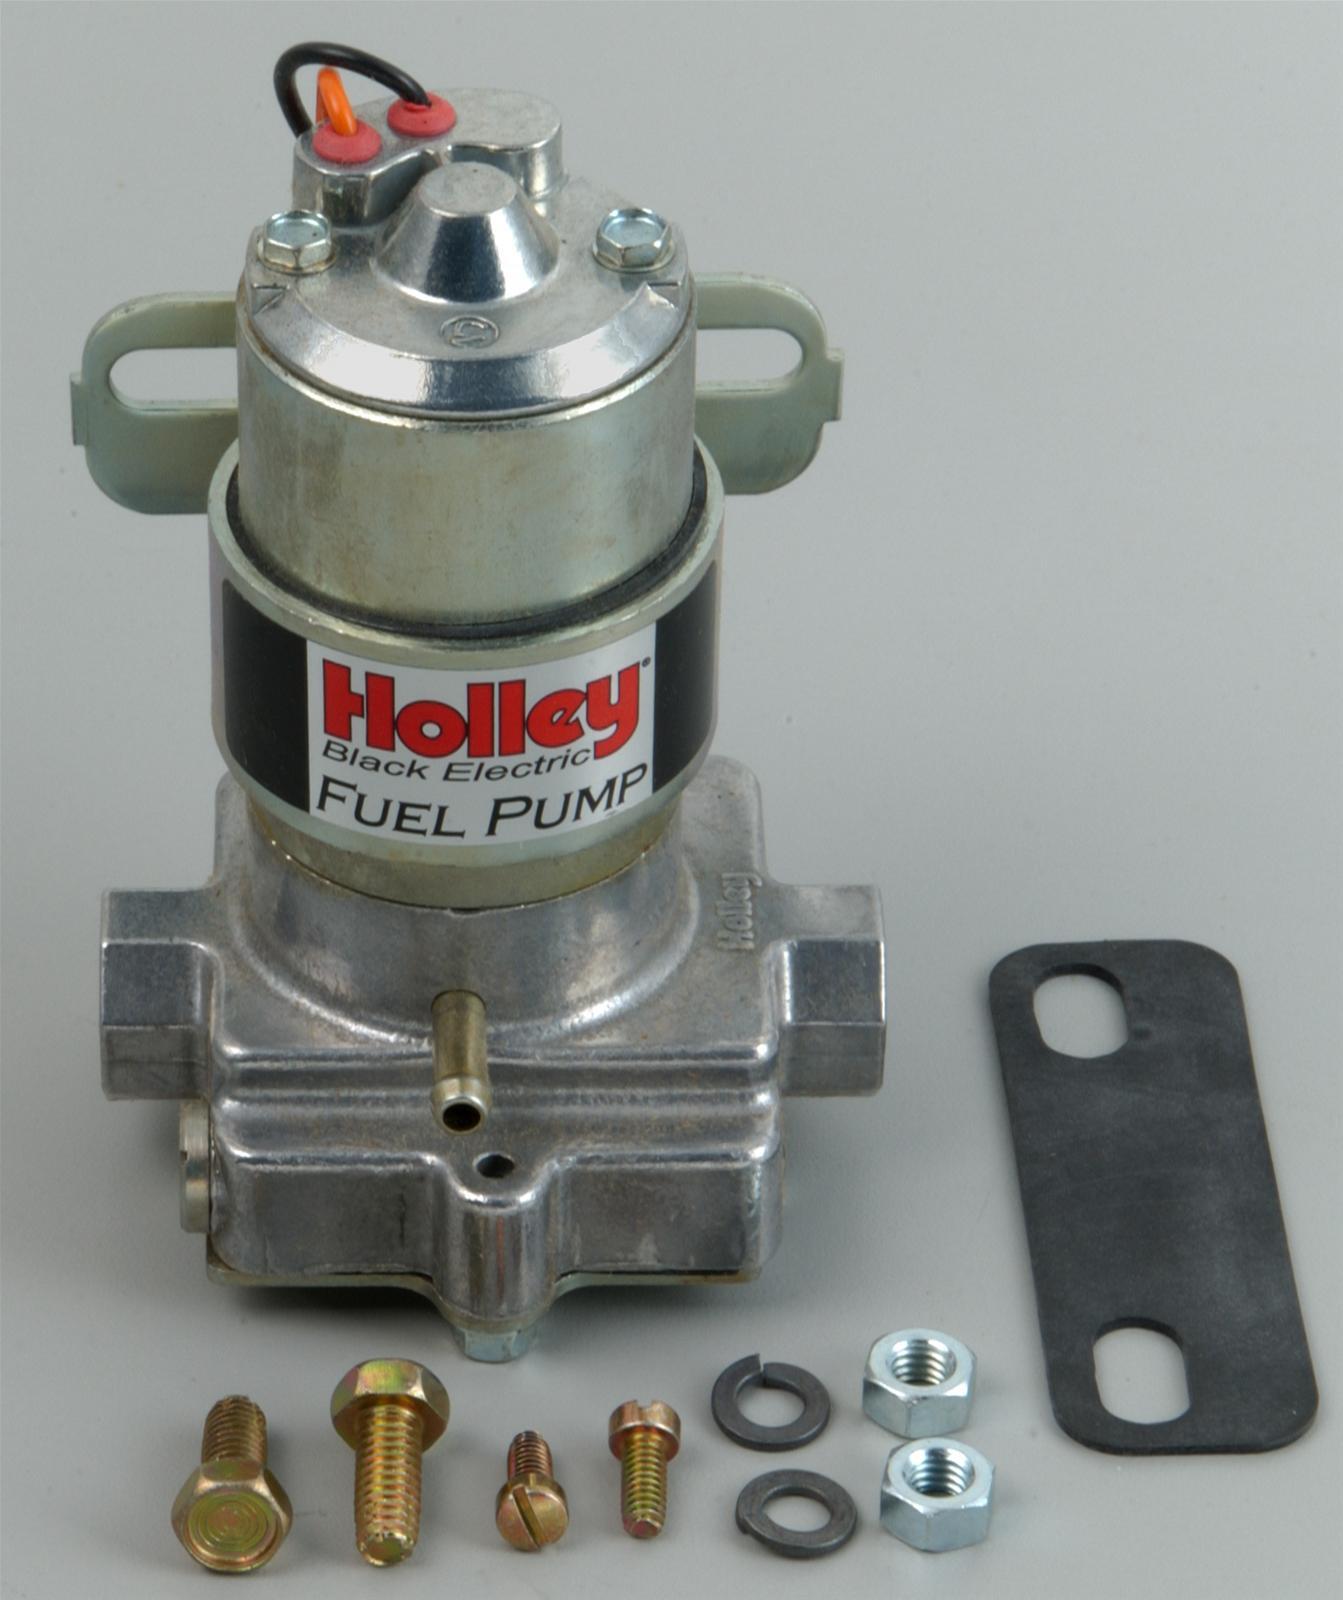 Holley Electric Fuel Pump 140 Gph Quotblackquot Electric Fuel Pump 712